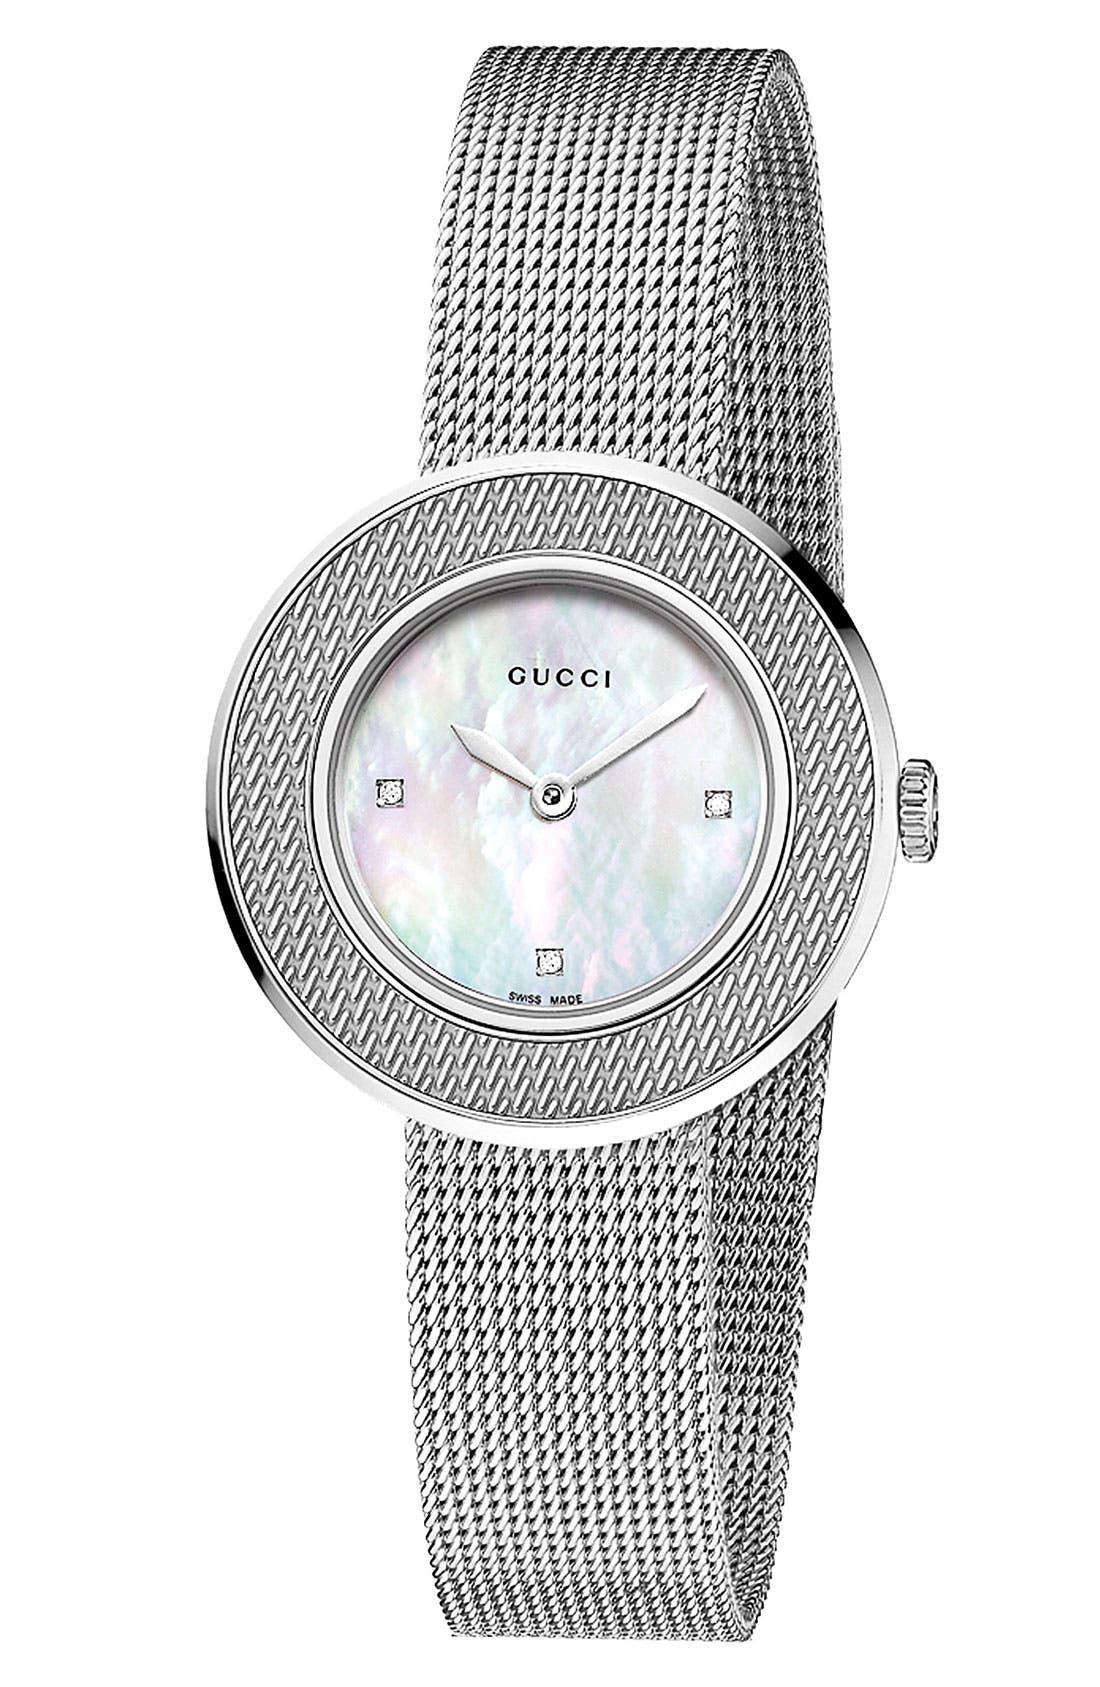 Main Image - Gucci 'U-Play' Round Diamond Dial Mesh Watch, 26mm